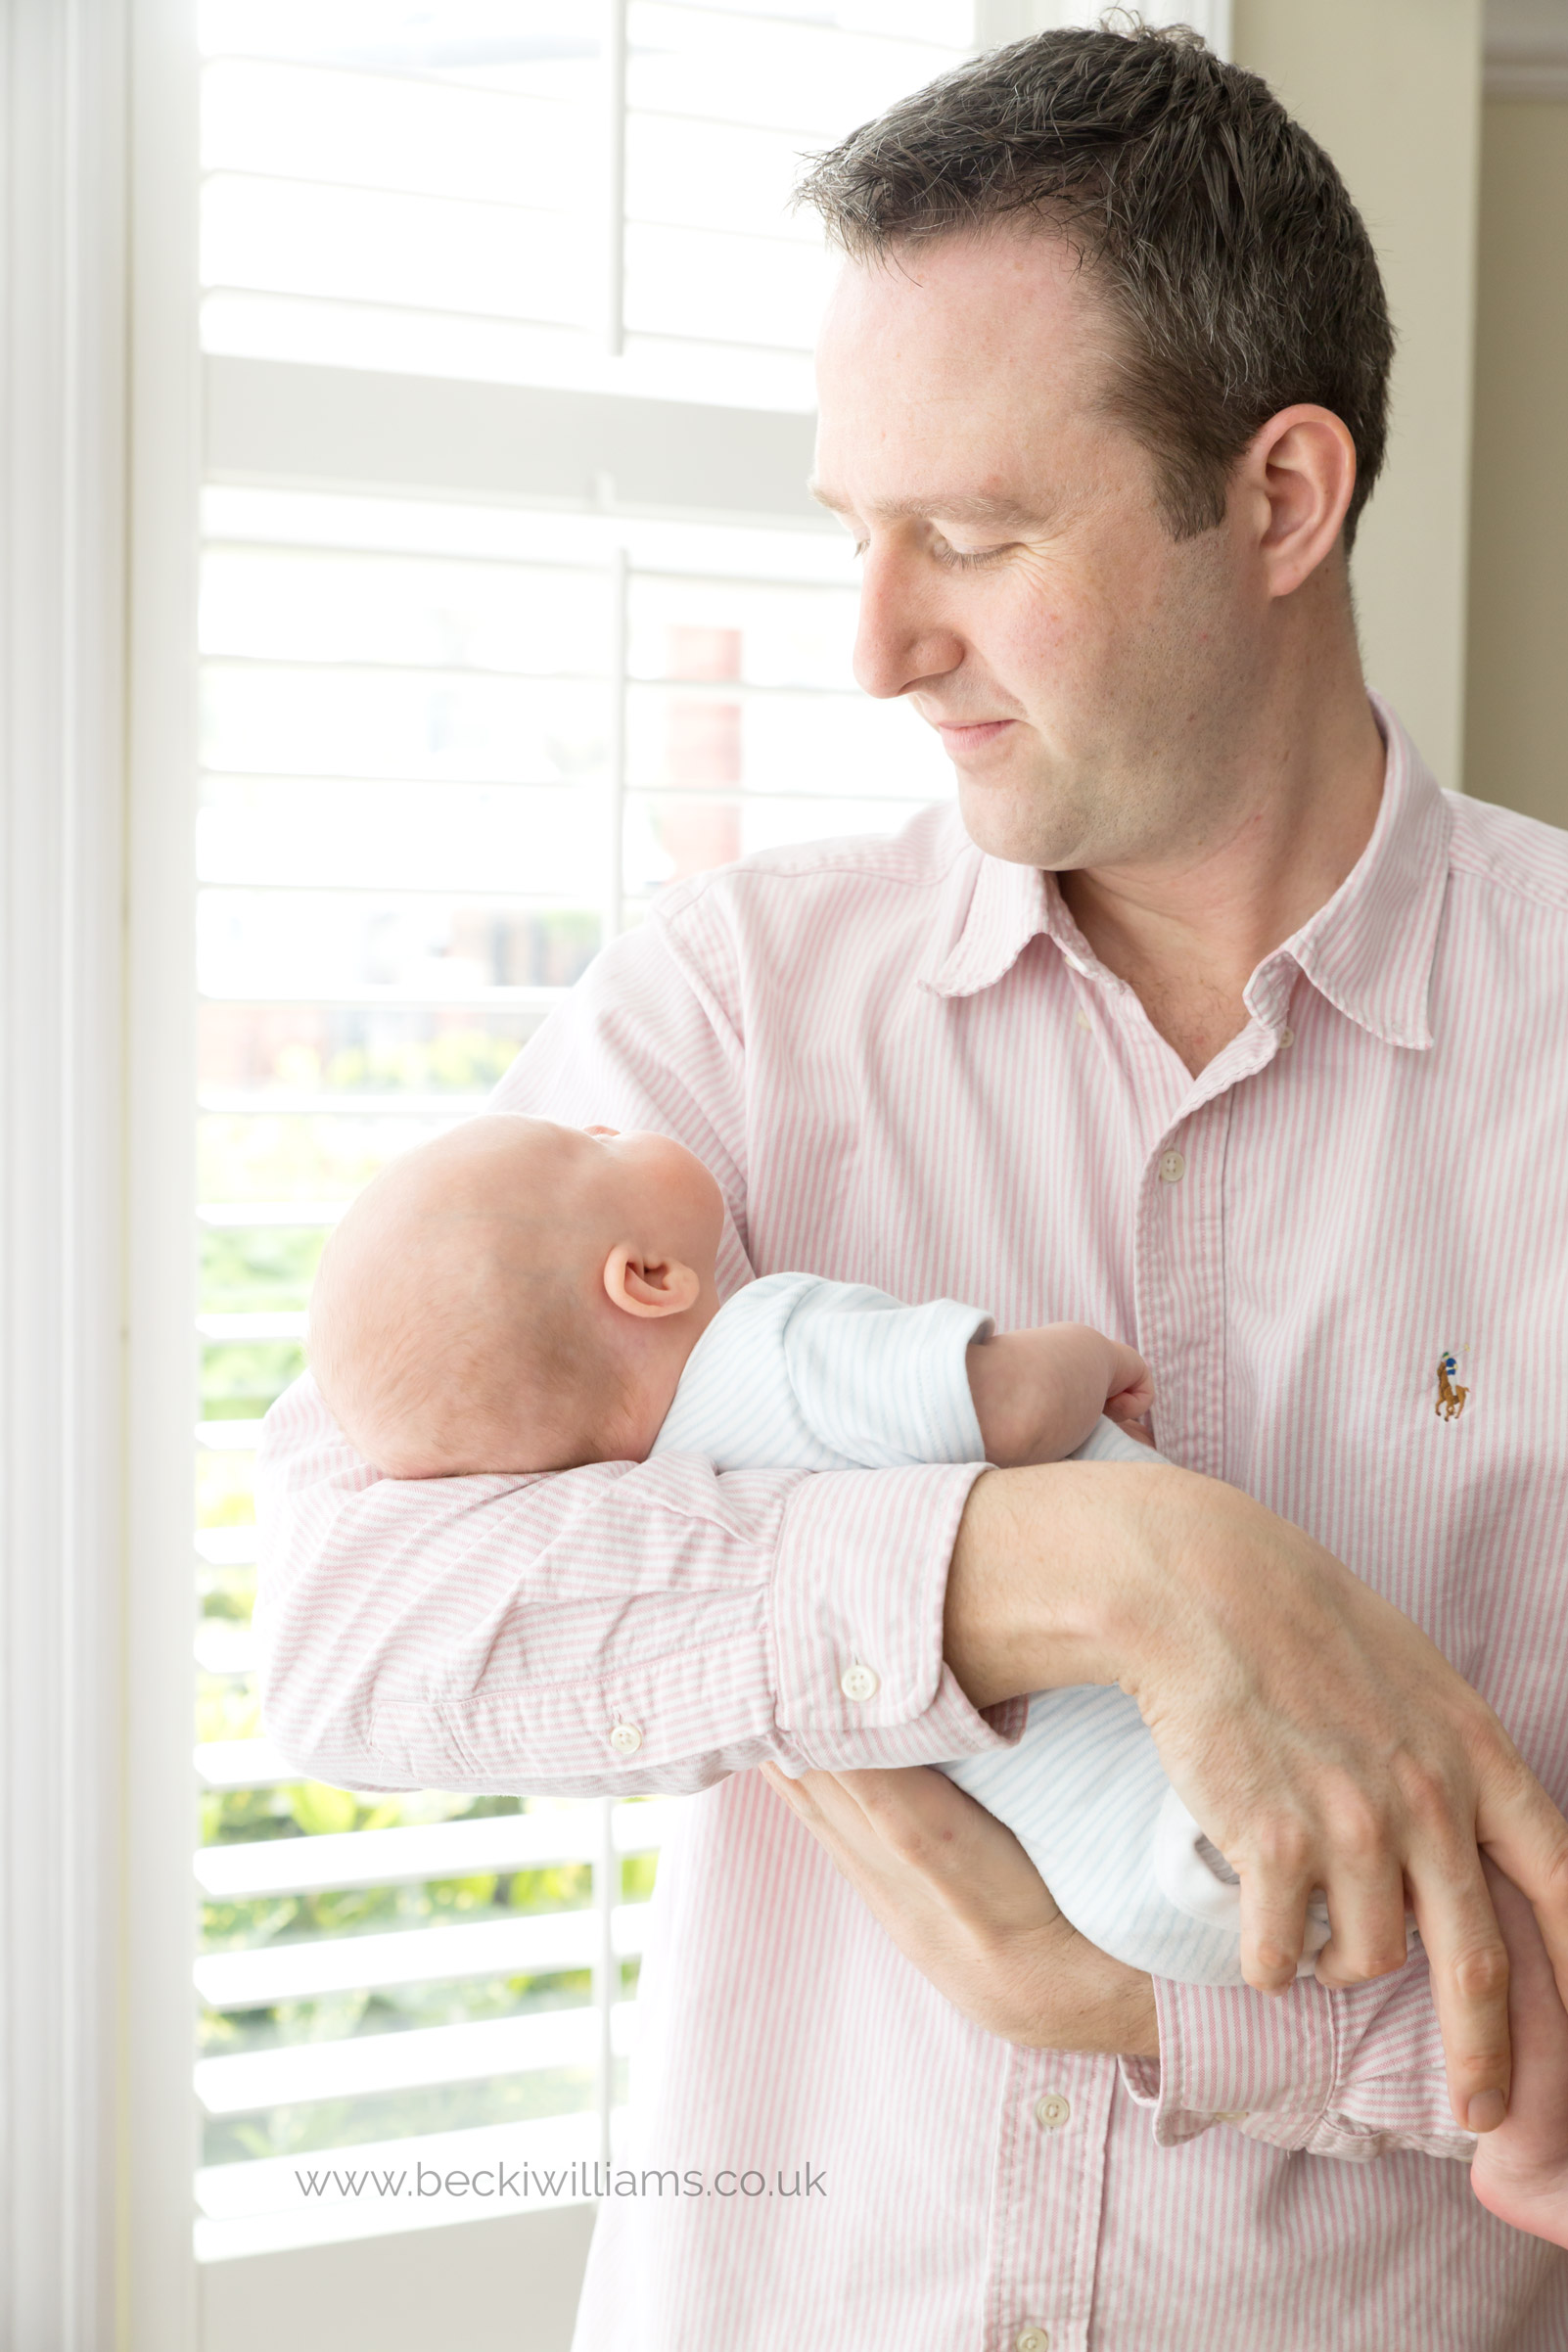 dad standing in beautiful window light holding his newborn baby son